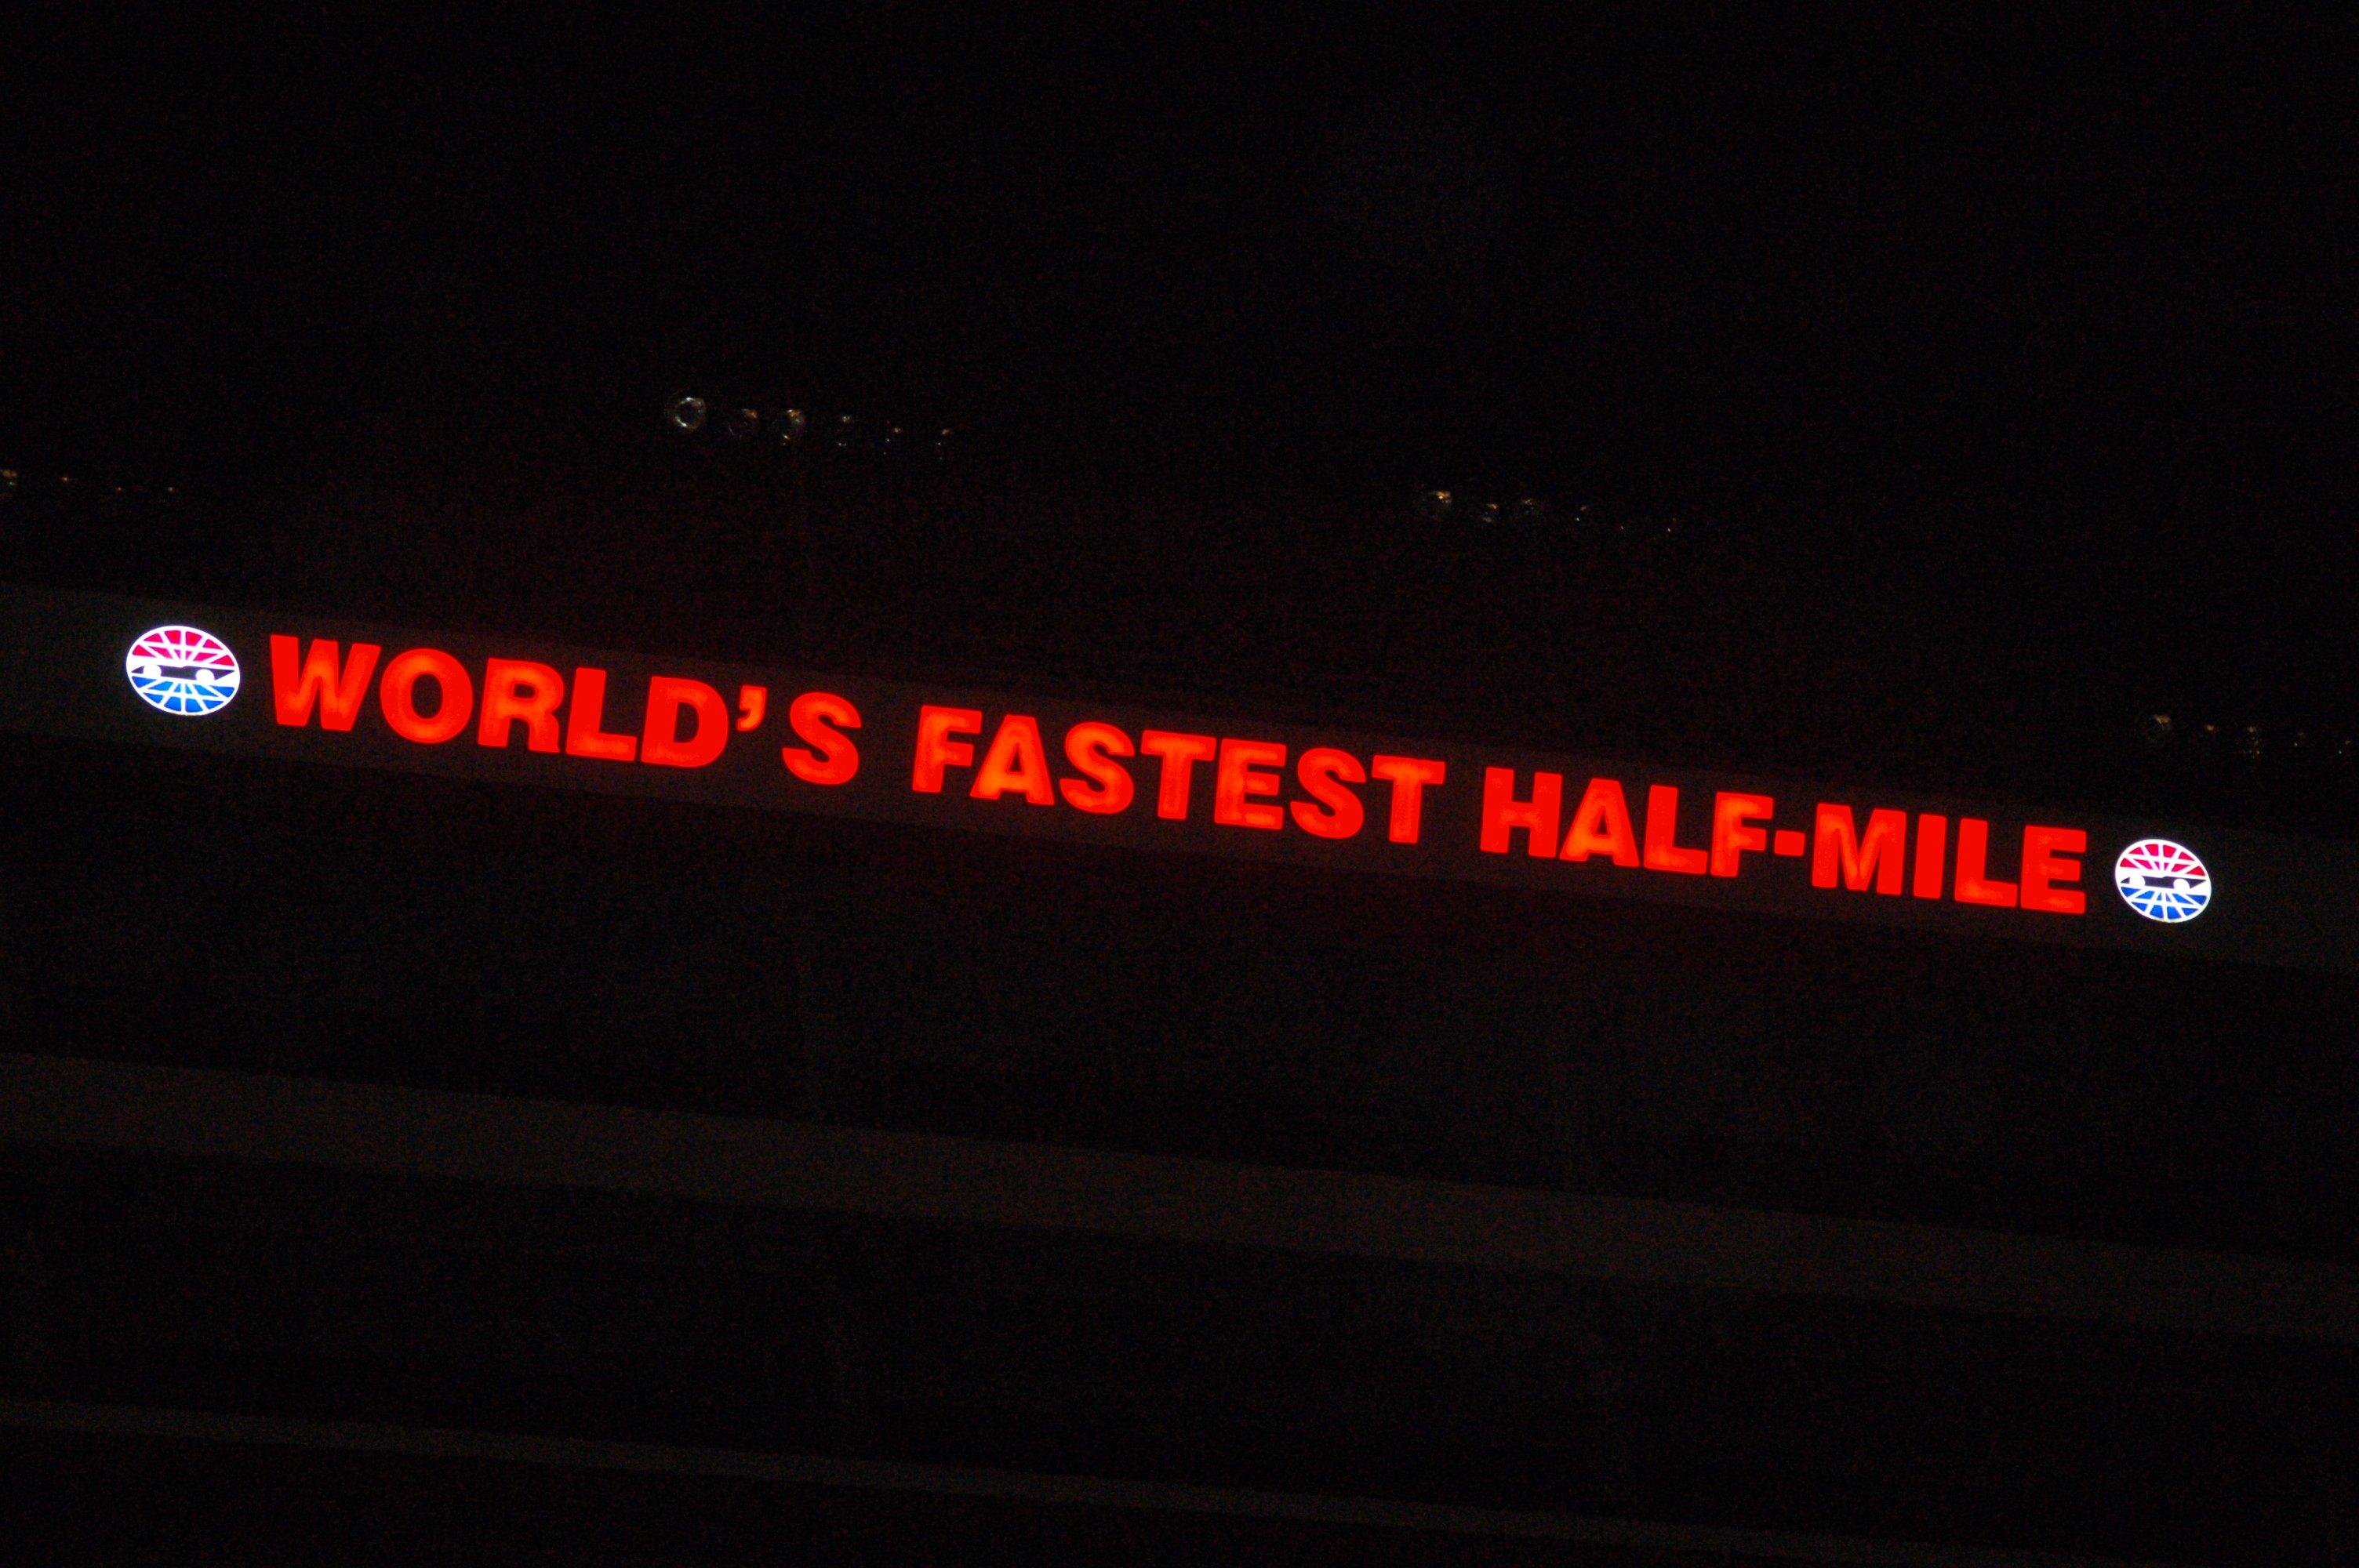 World's Fastest Half-Mile